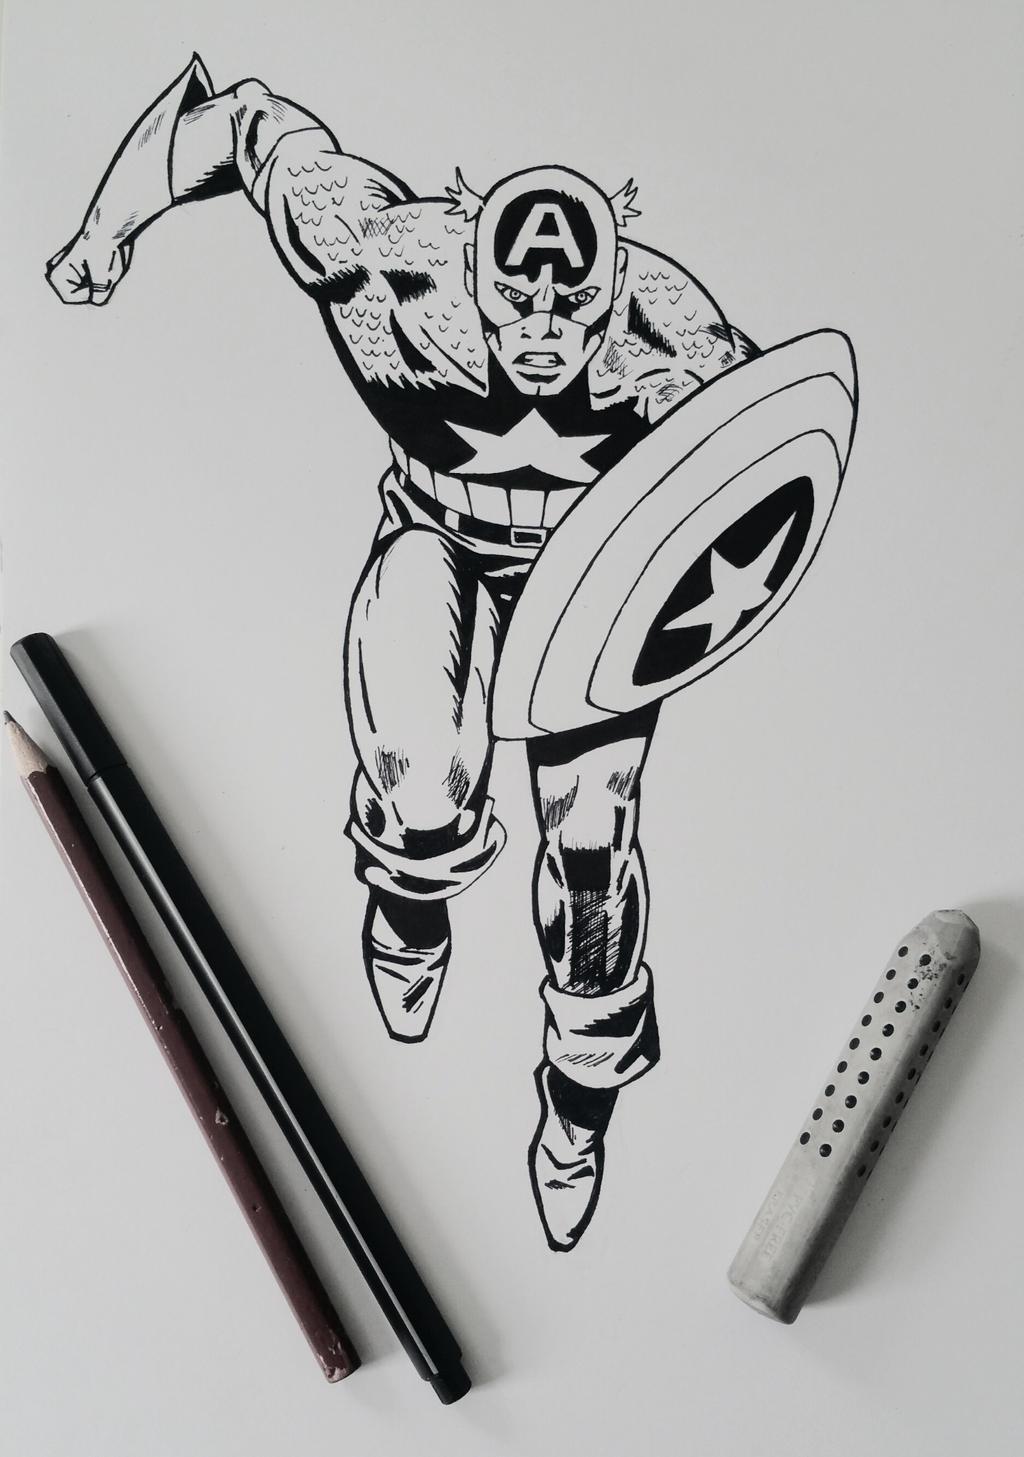 Line Art America : Captain america line art by xxinfinite firexx on deviantart